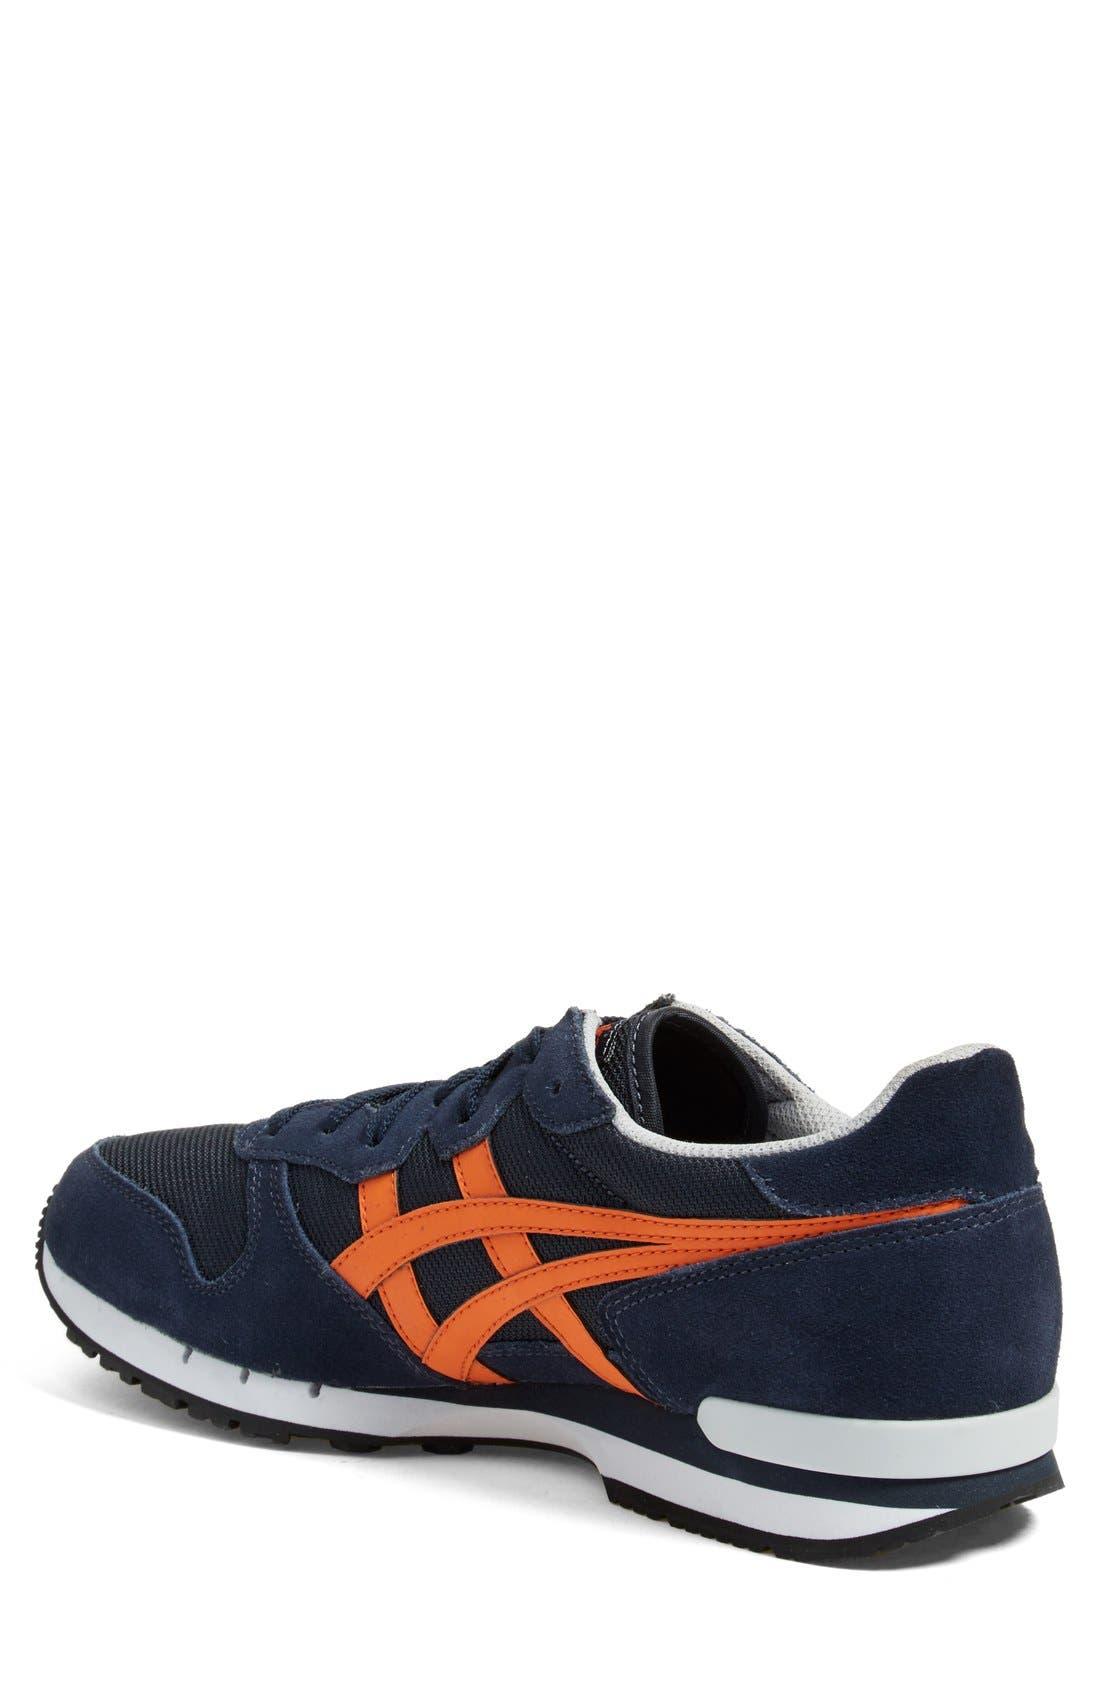 Alternate Image 2  - ASICS® Onitsuka Tiger 'Alvarado' Sneaker (Men)